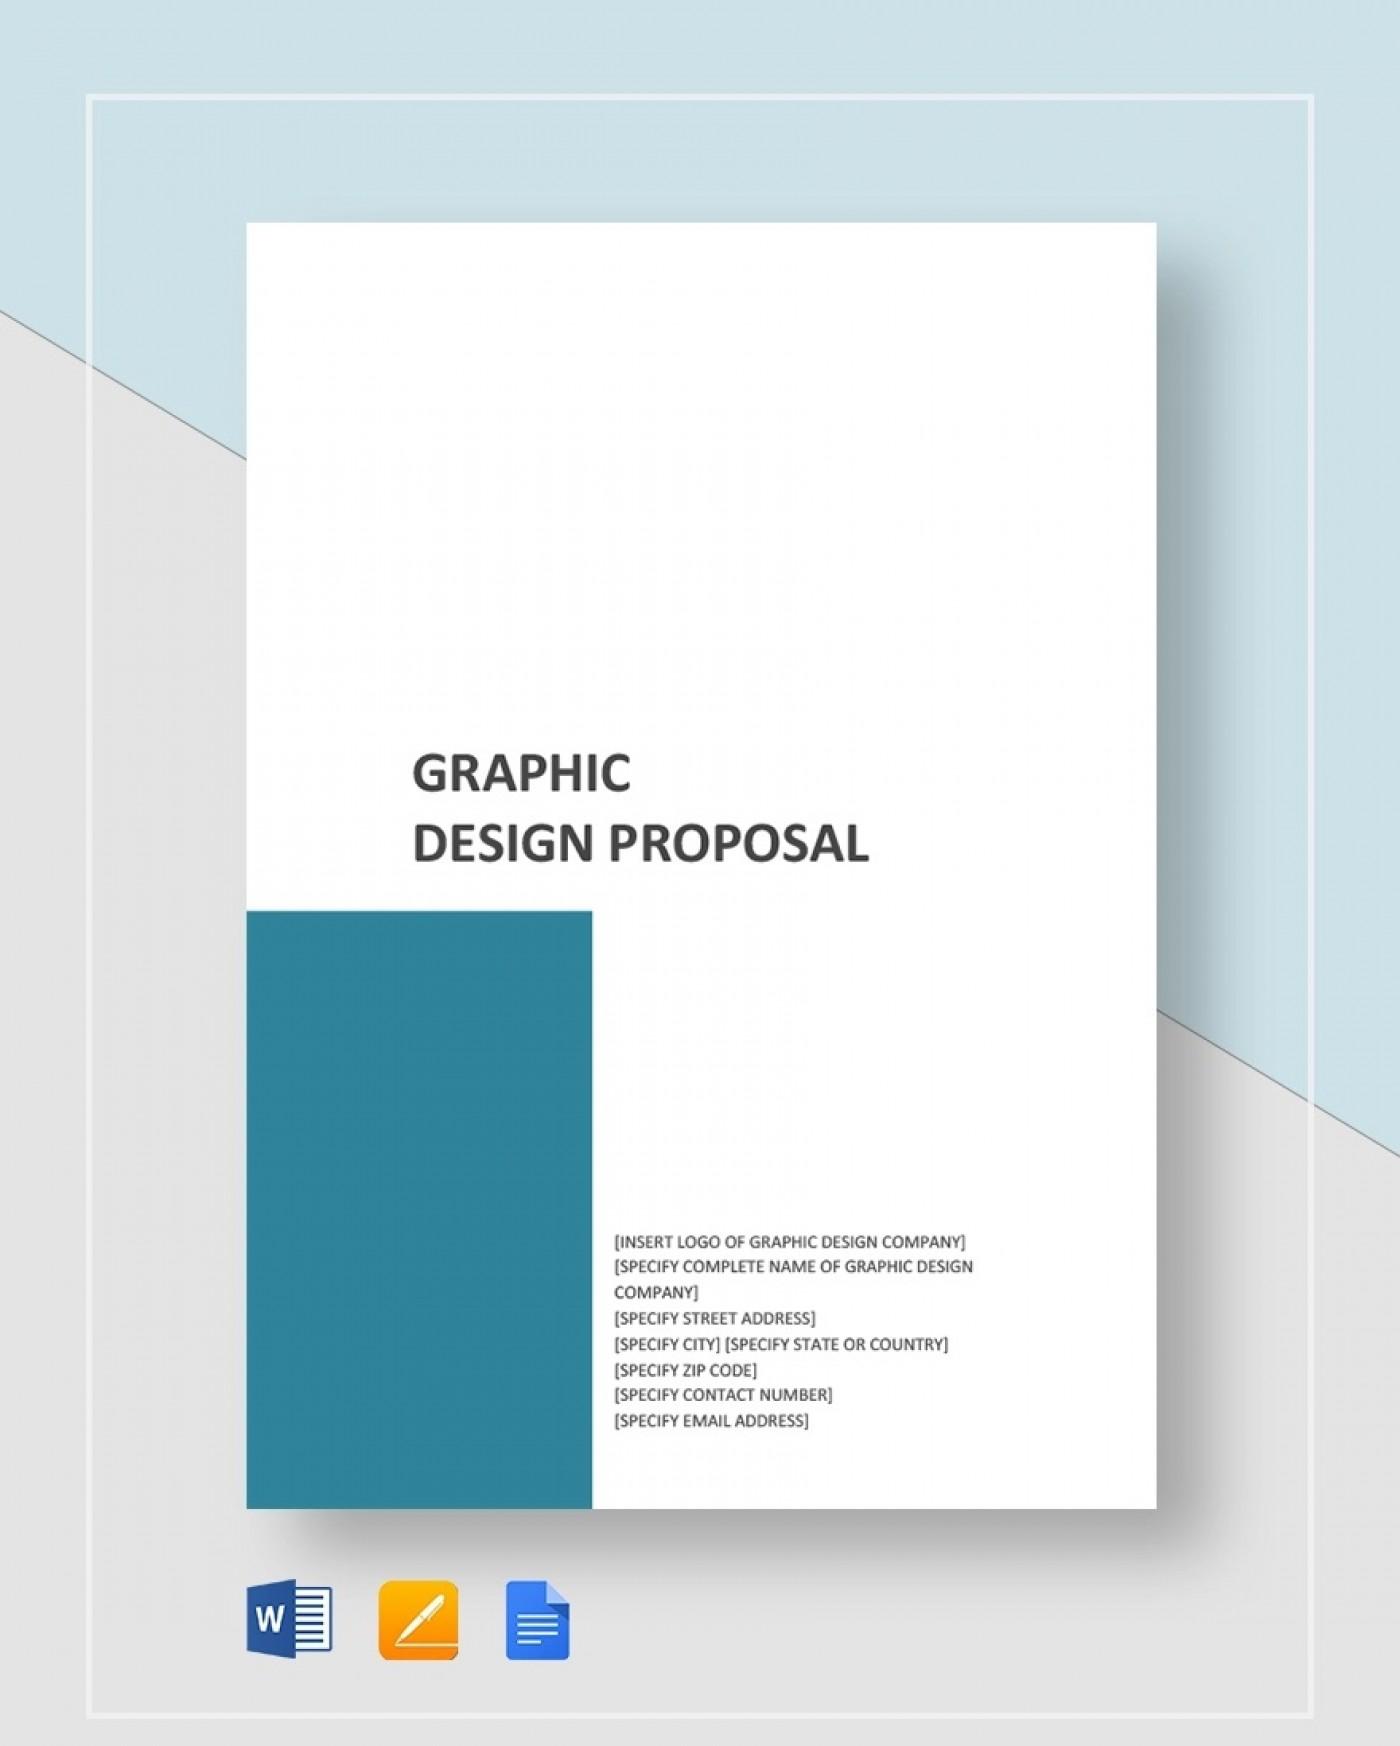 Template Graphic Design Proposal Idea  Pdf Sample1400